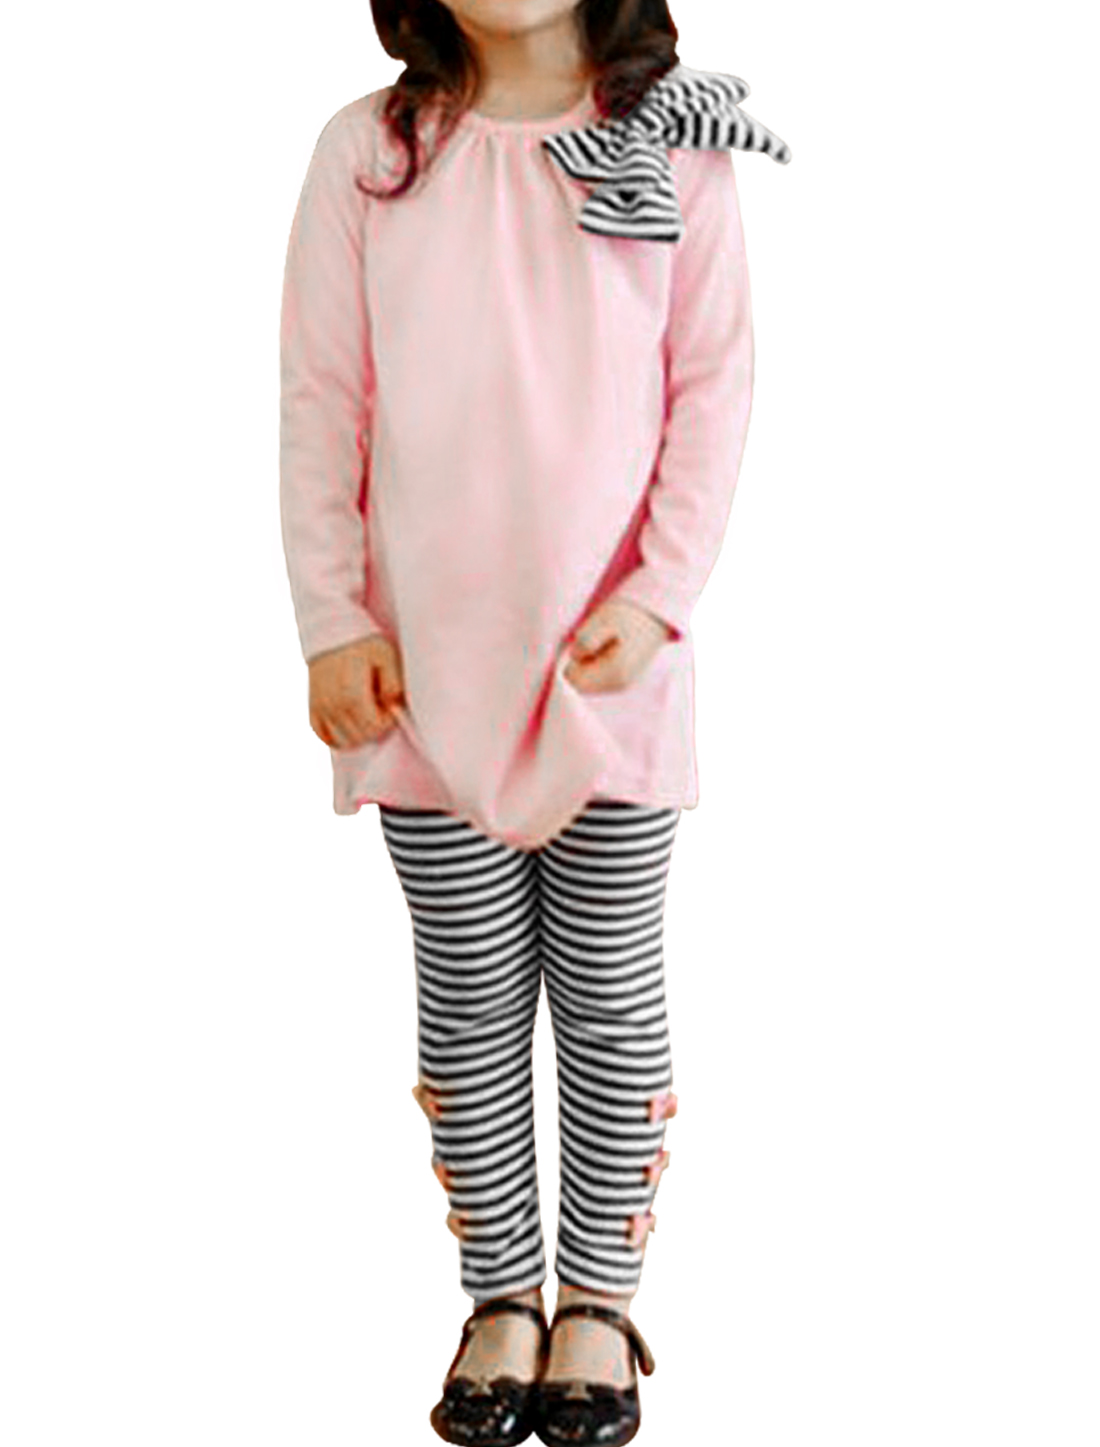 Spring Girls Pullover Shirt & Elastic Waist Pants Pink Black 5